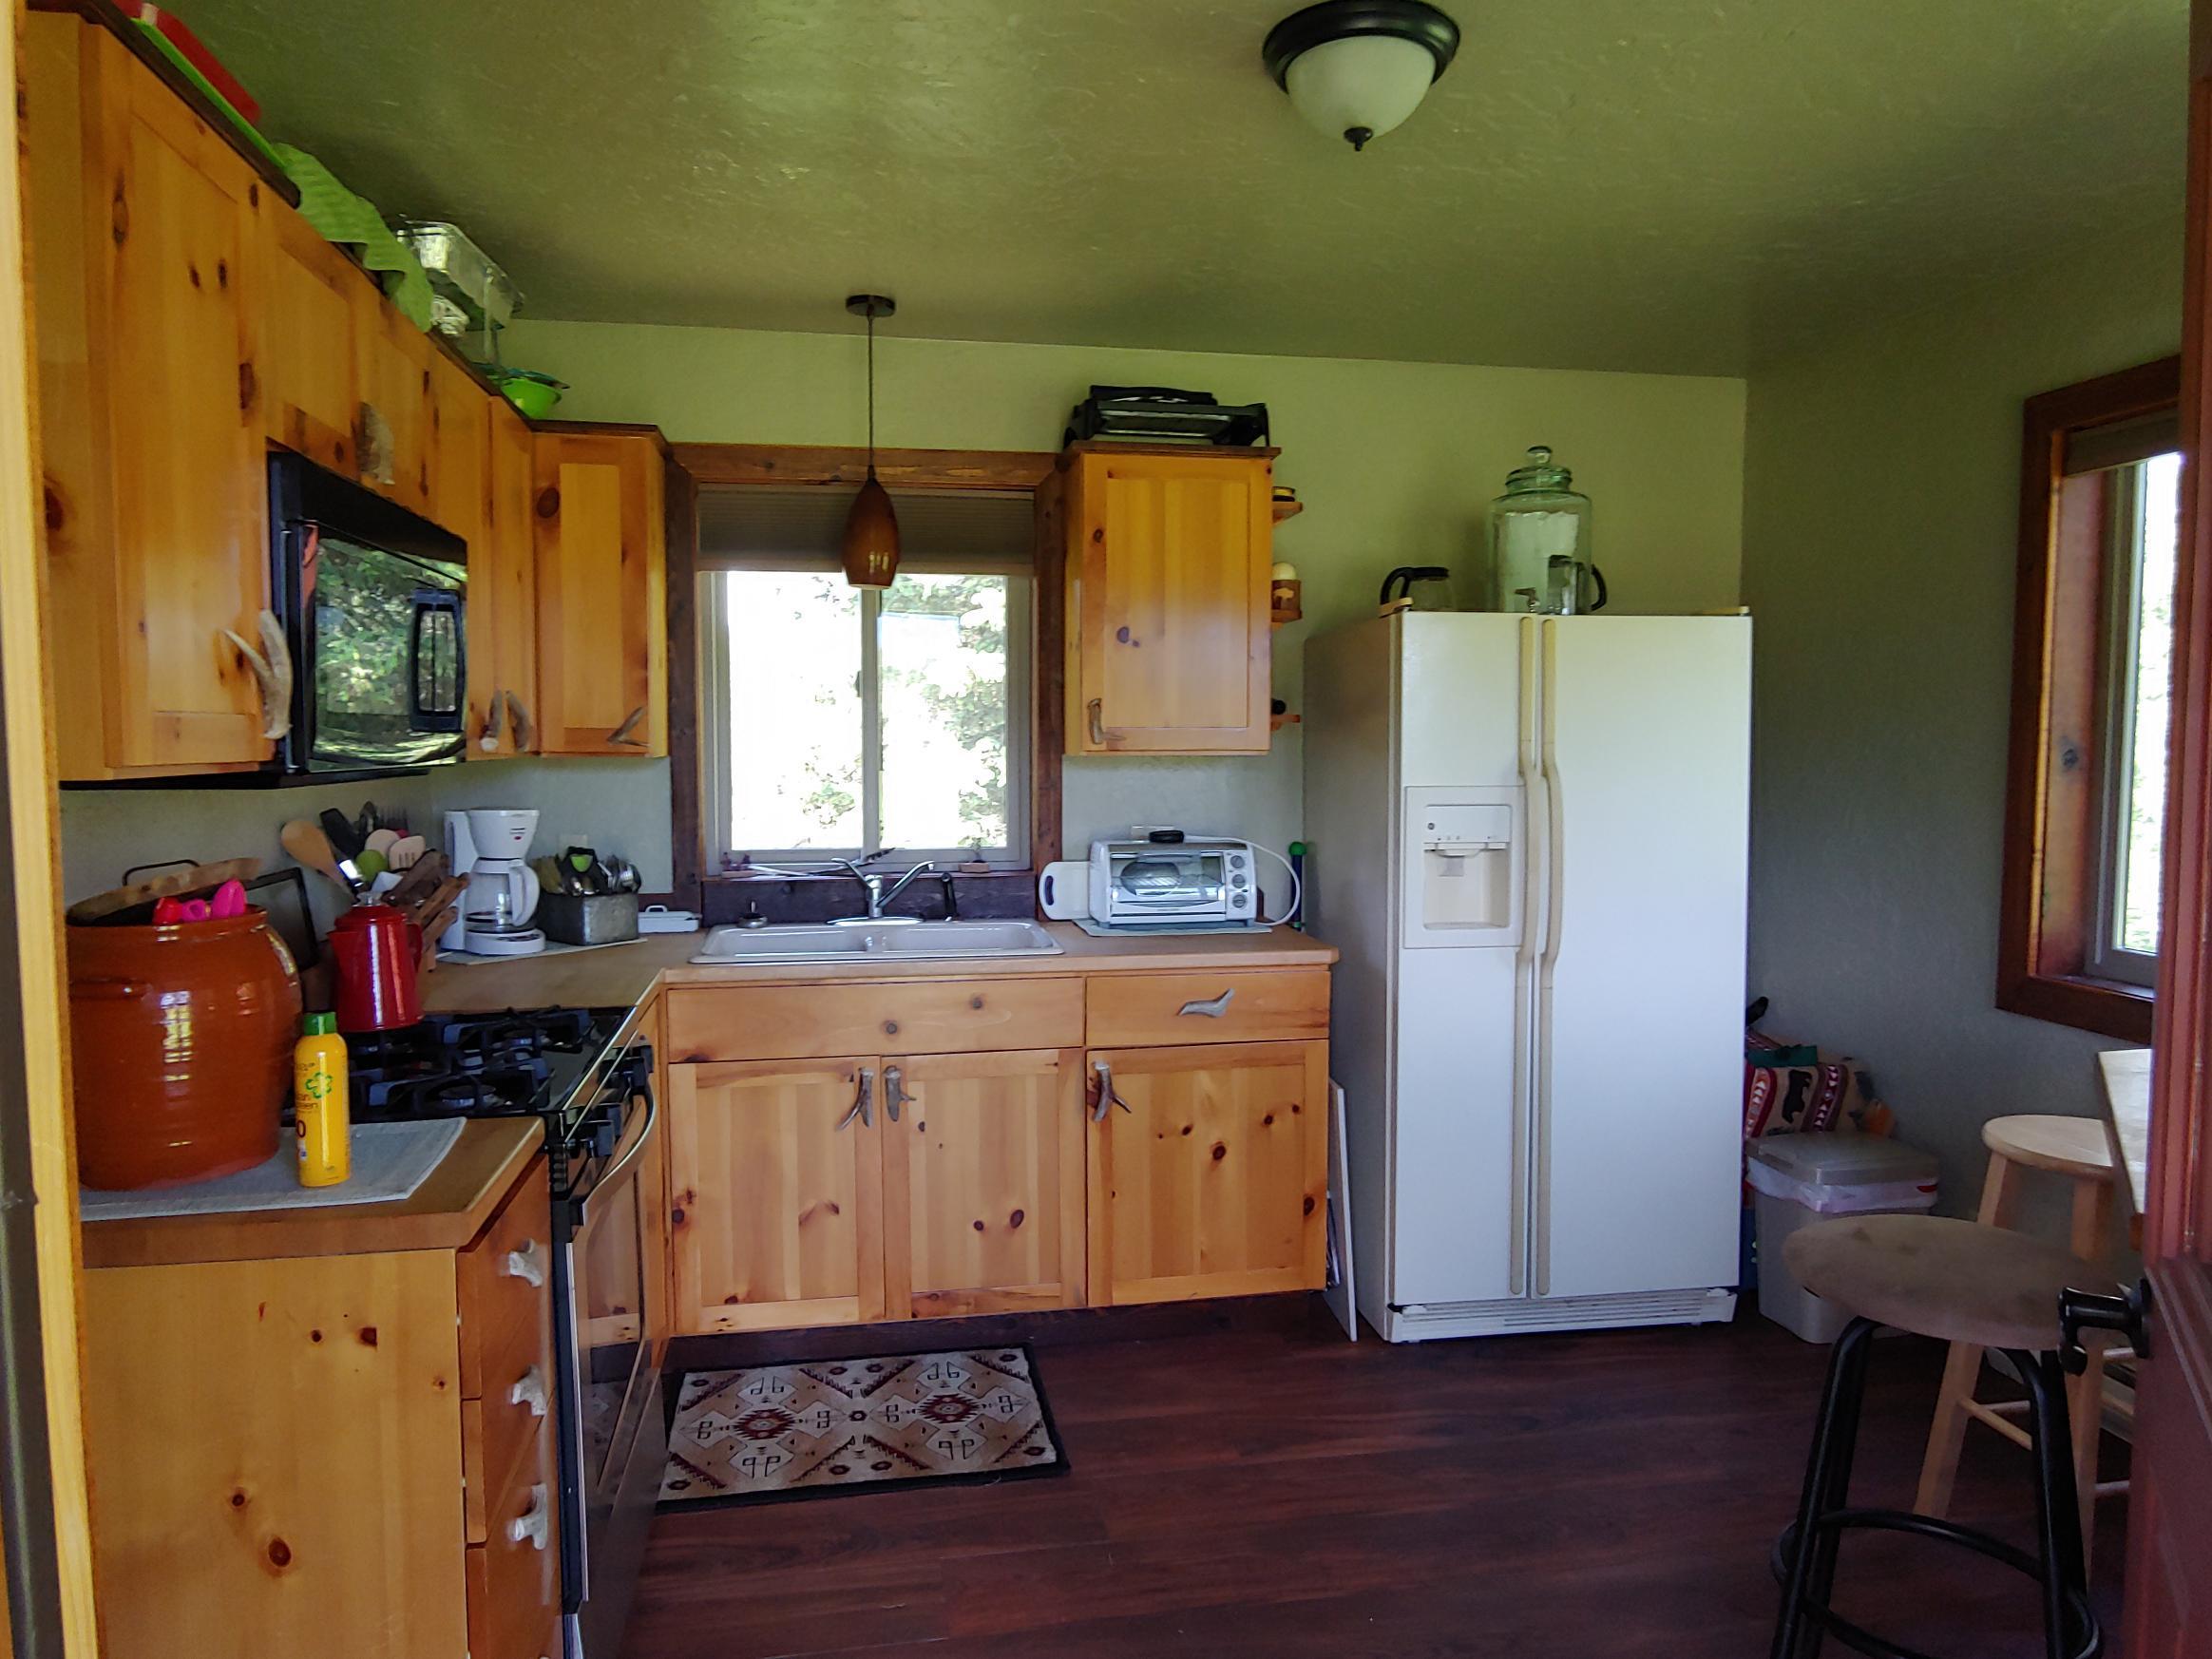 7395 Hwy 83 kitchen